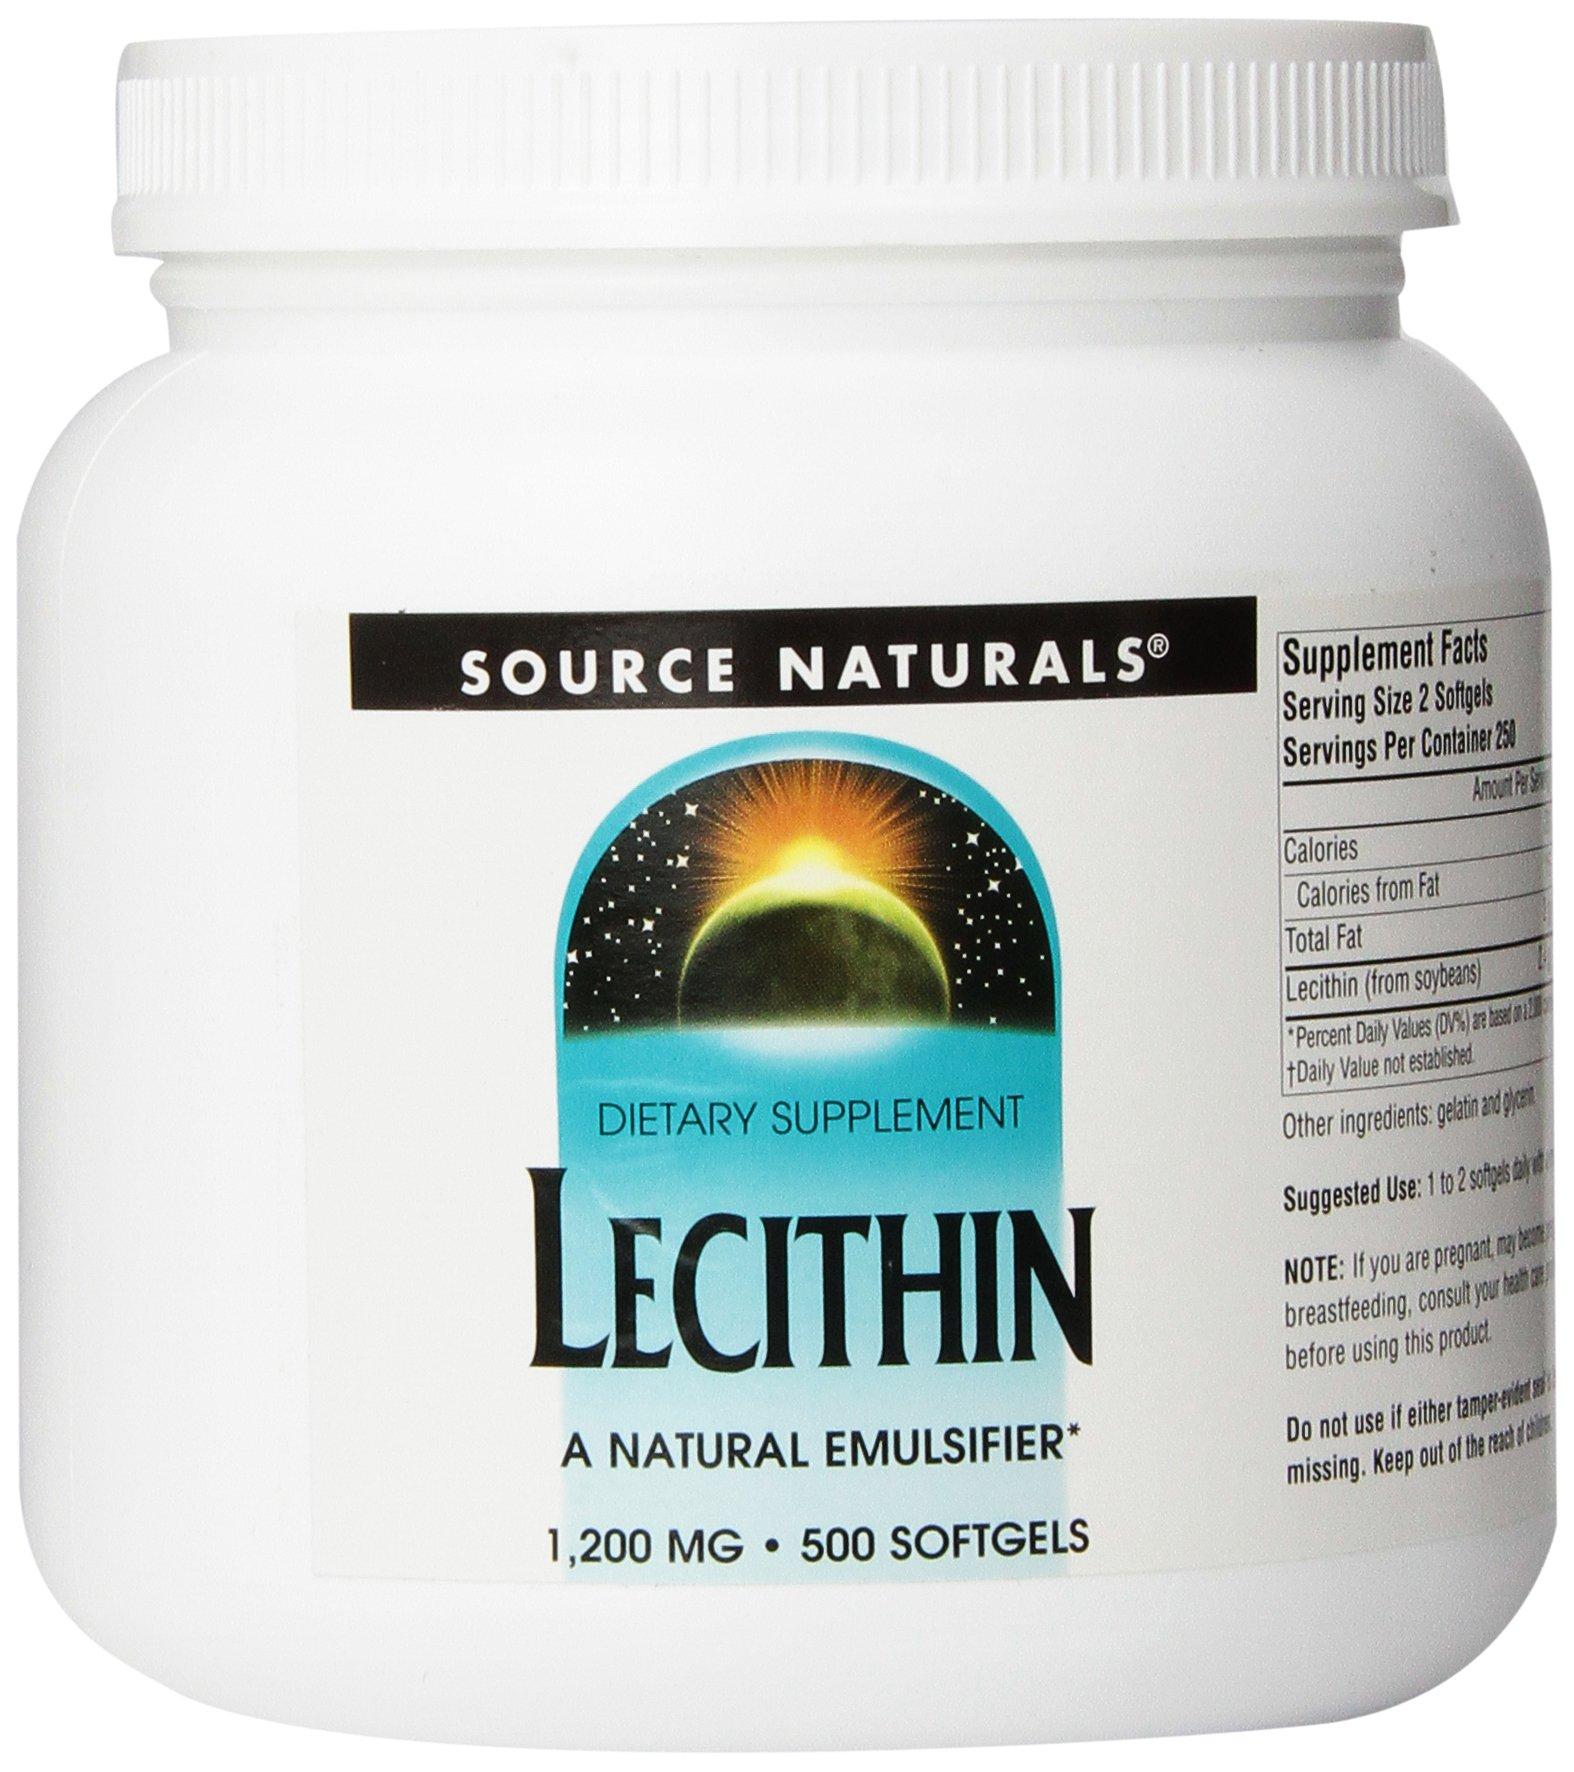 Source Naturals Lecithin 1200mg, A Natural Emulsifier, 500 Softgels